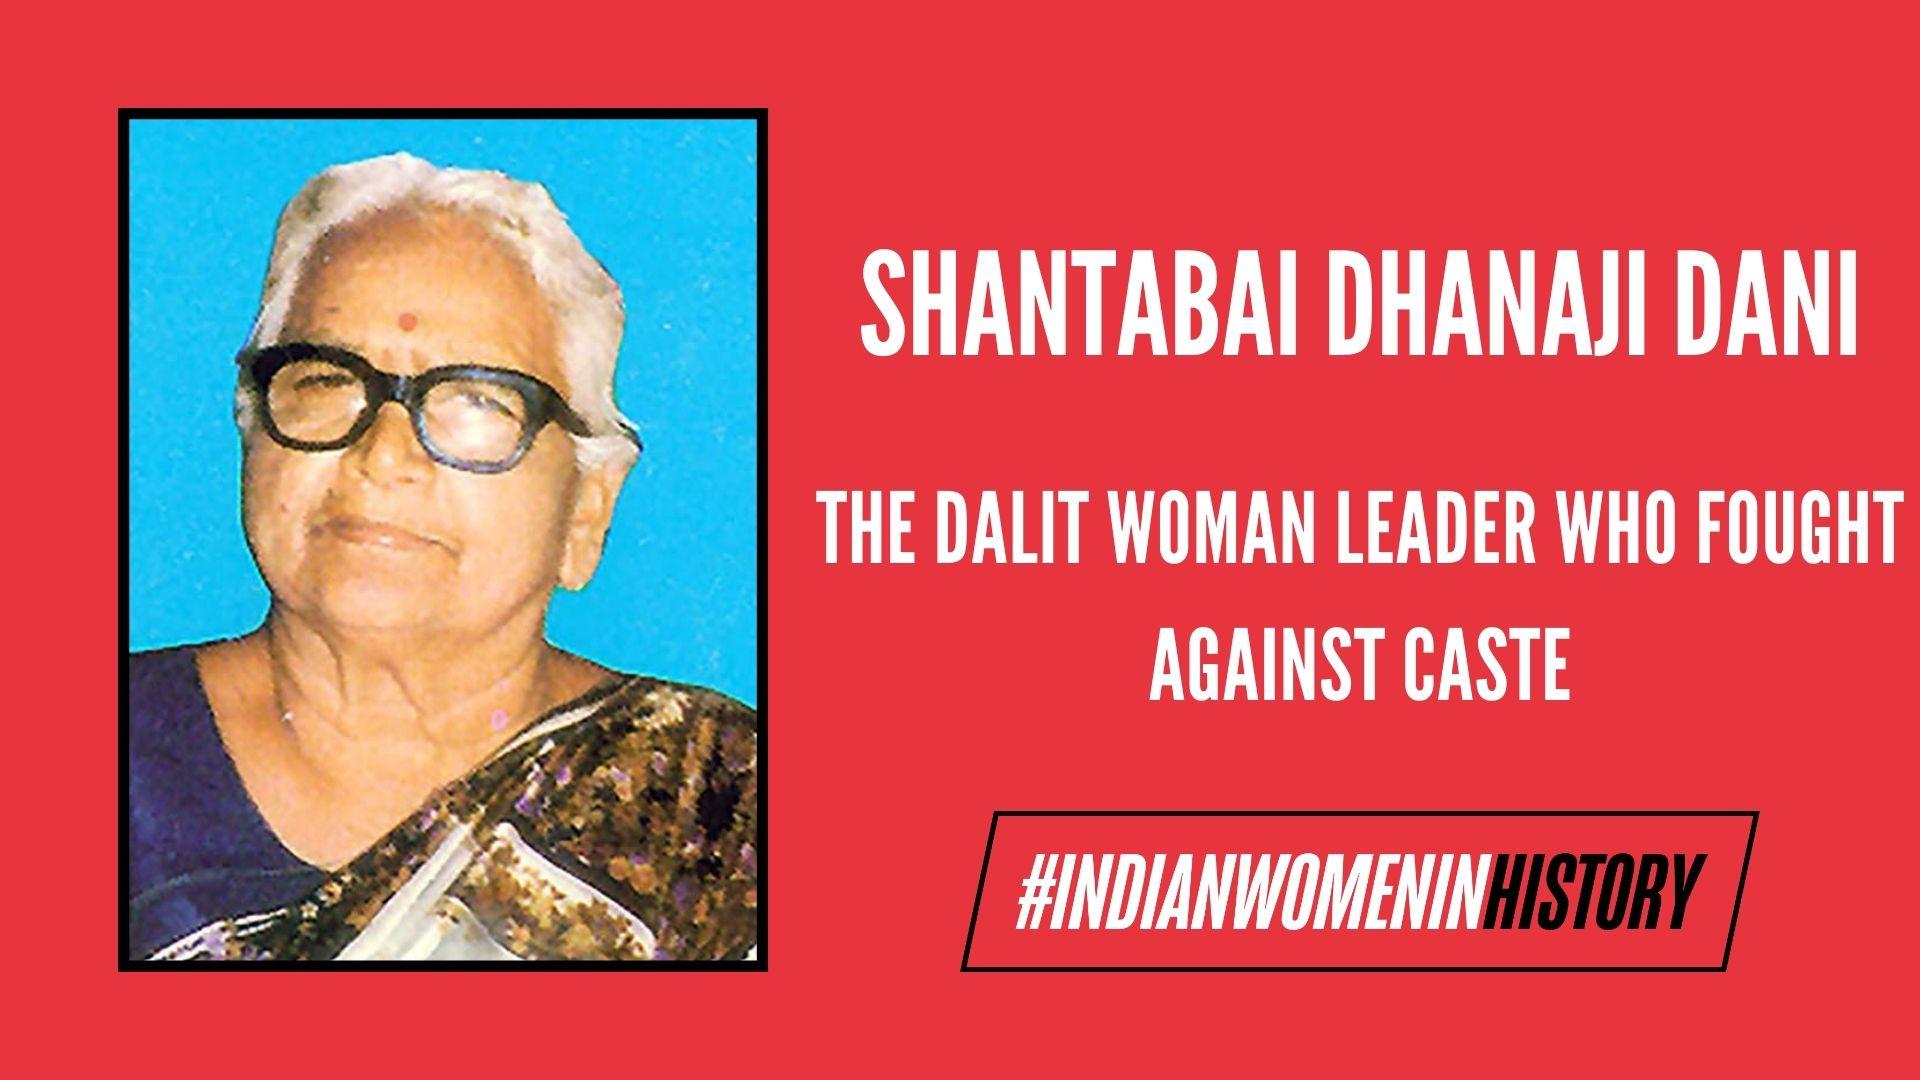 Shantabai Dhanaji Dani: The Dalit Woman Leader Who Fought Against Caste